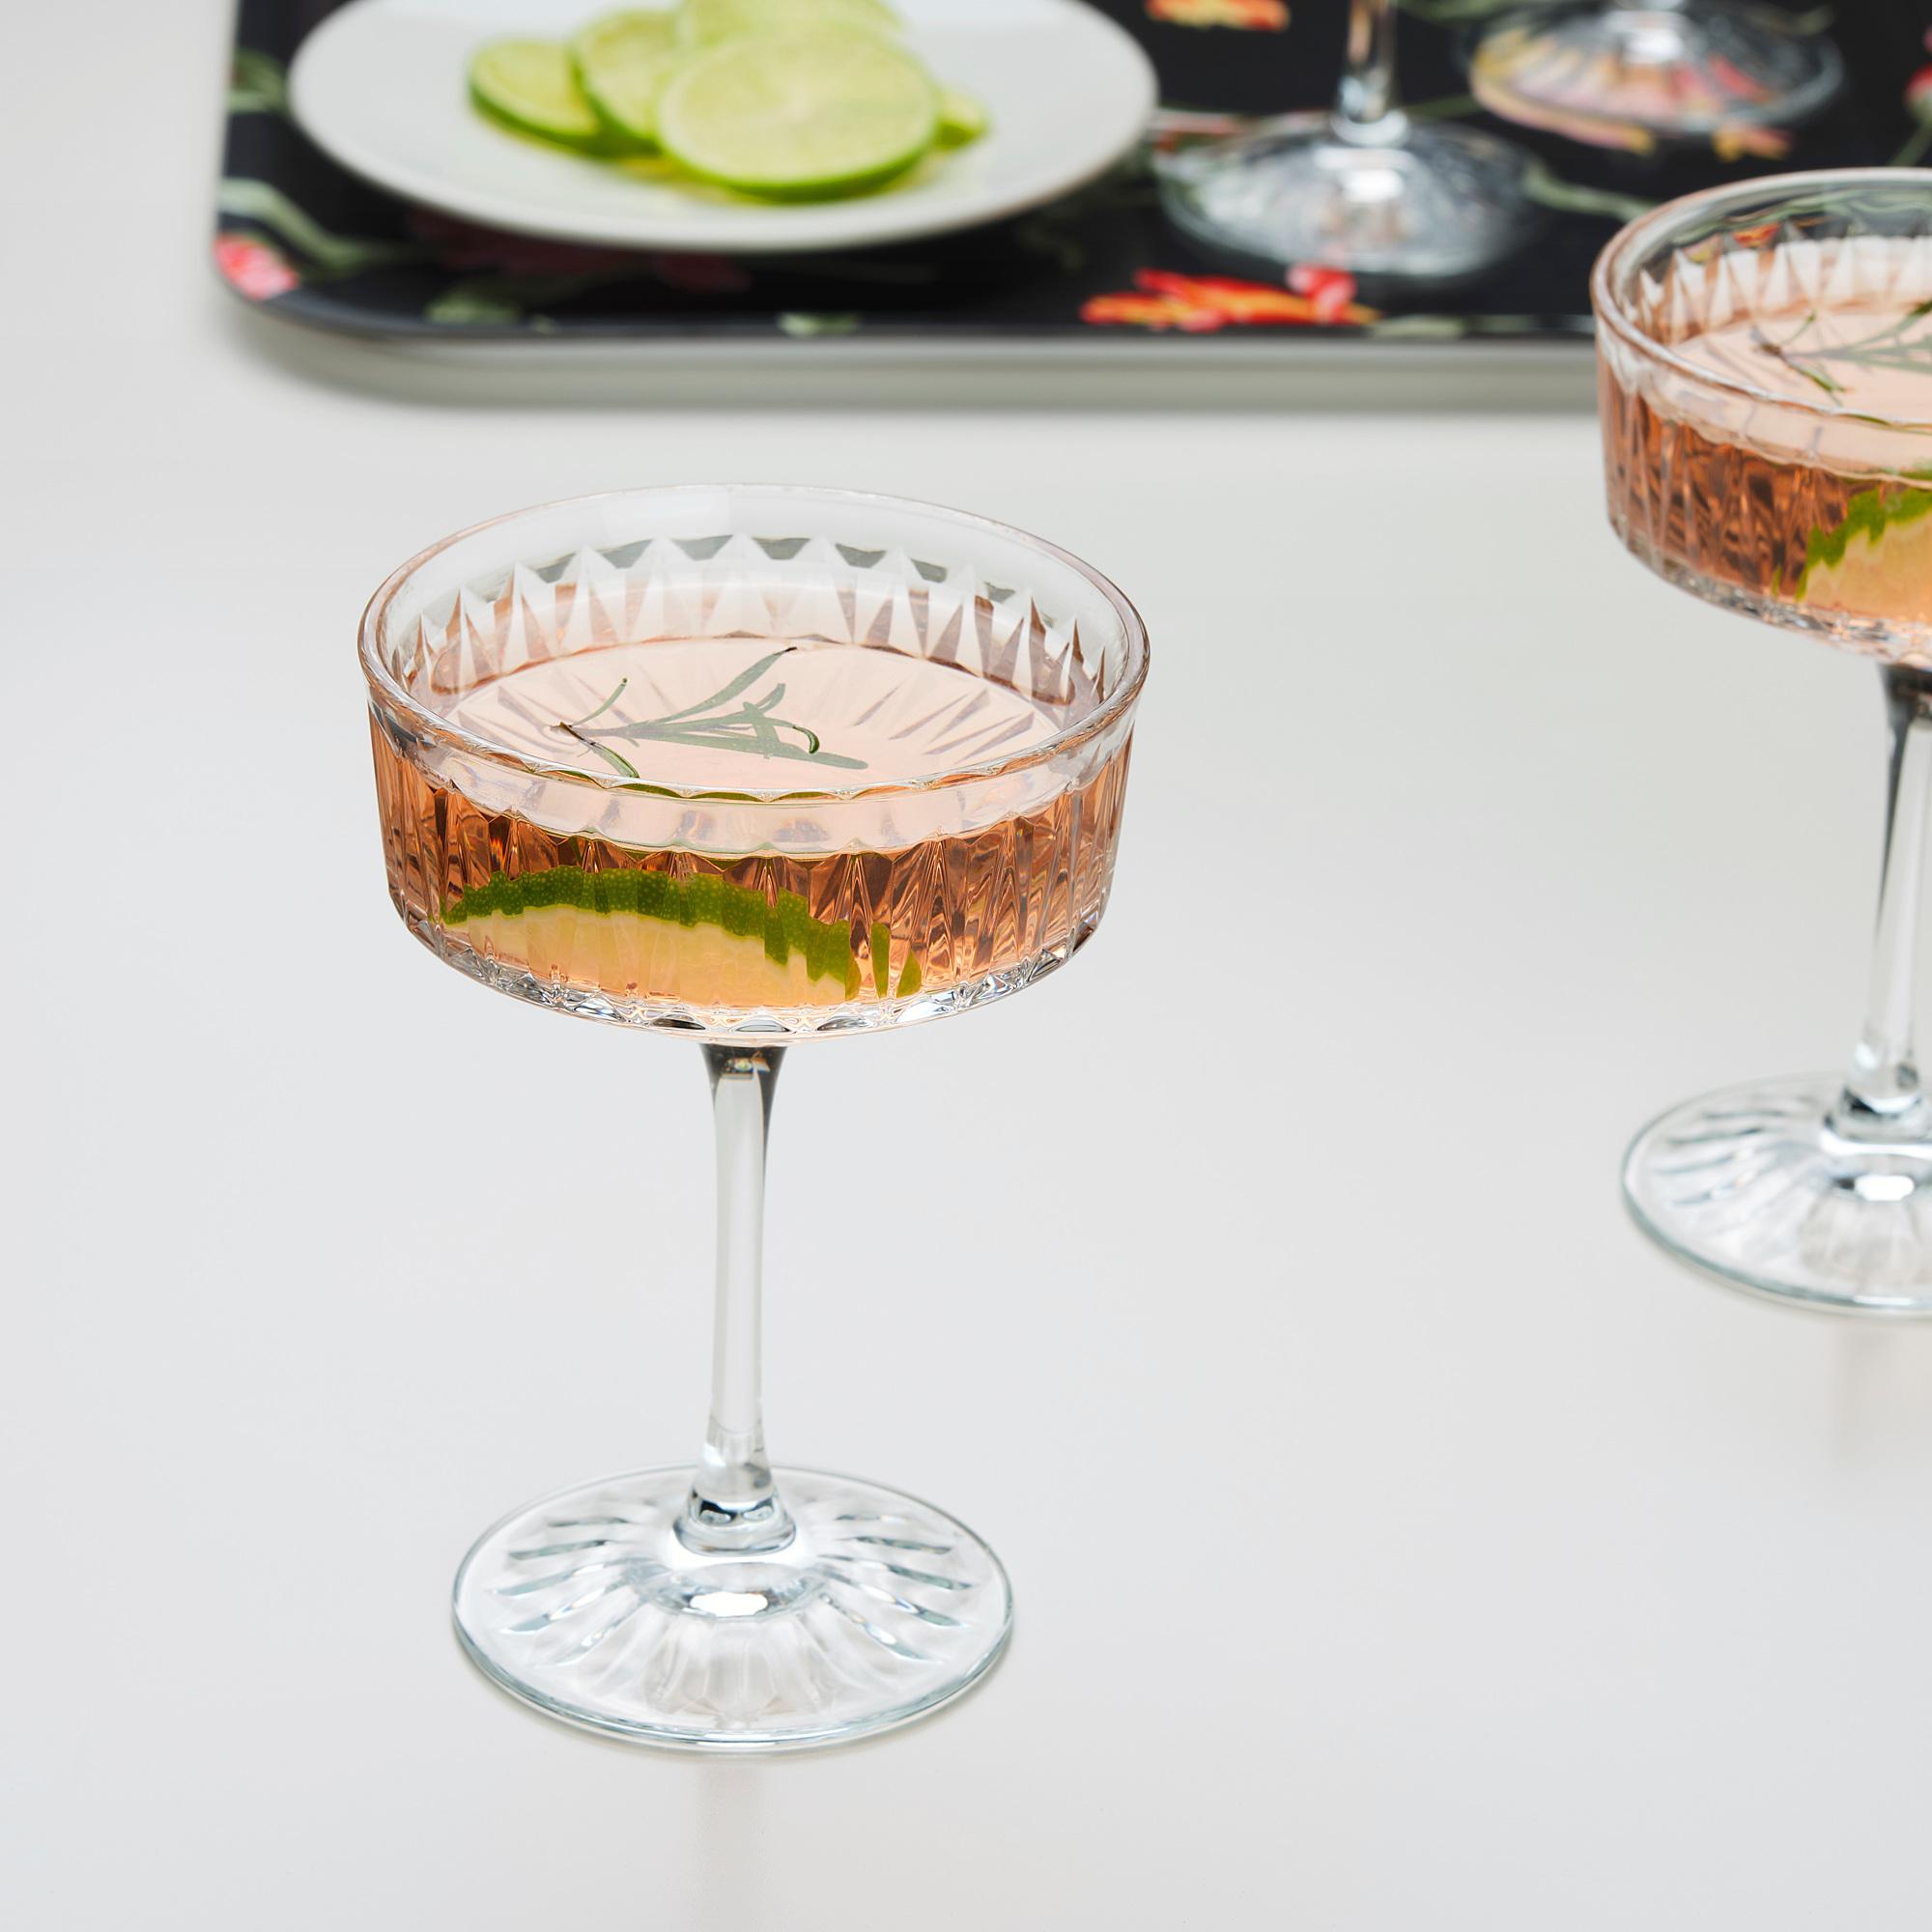 šampano erekcija prideti nario dydi